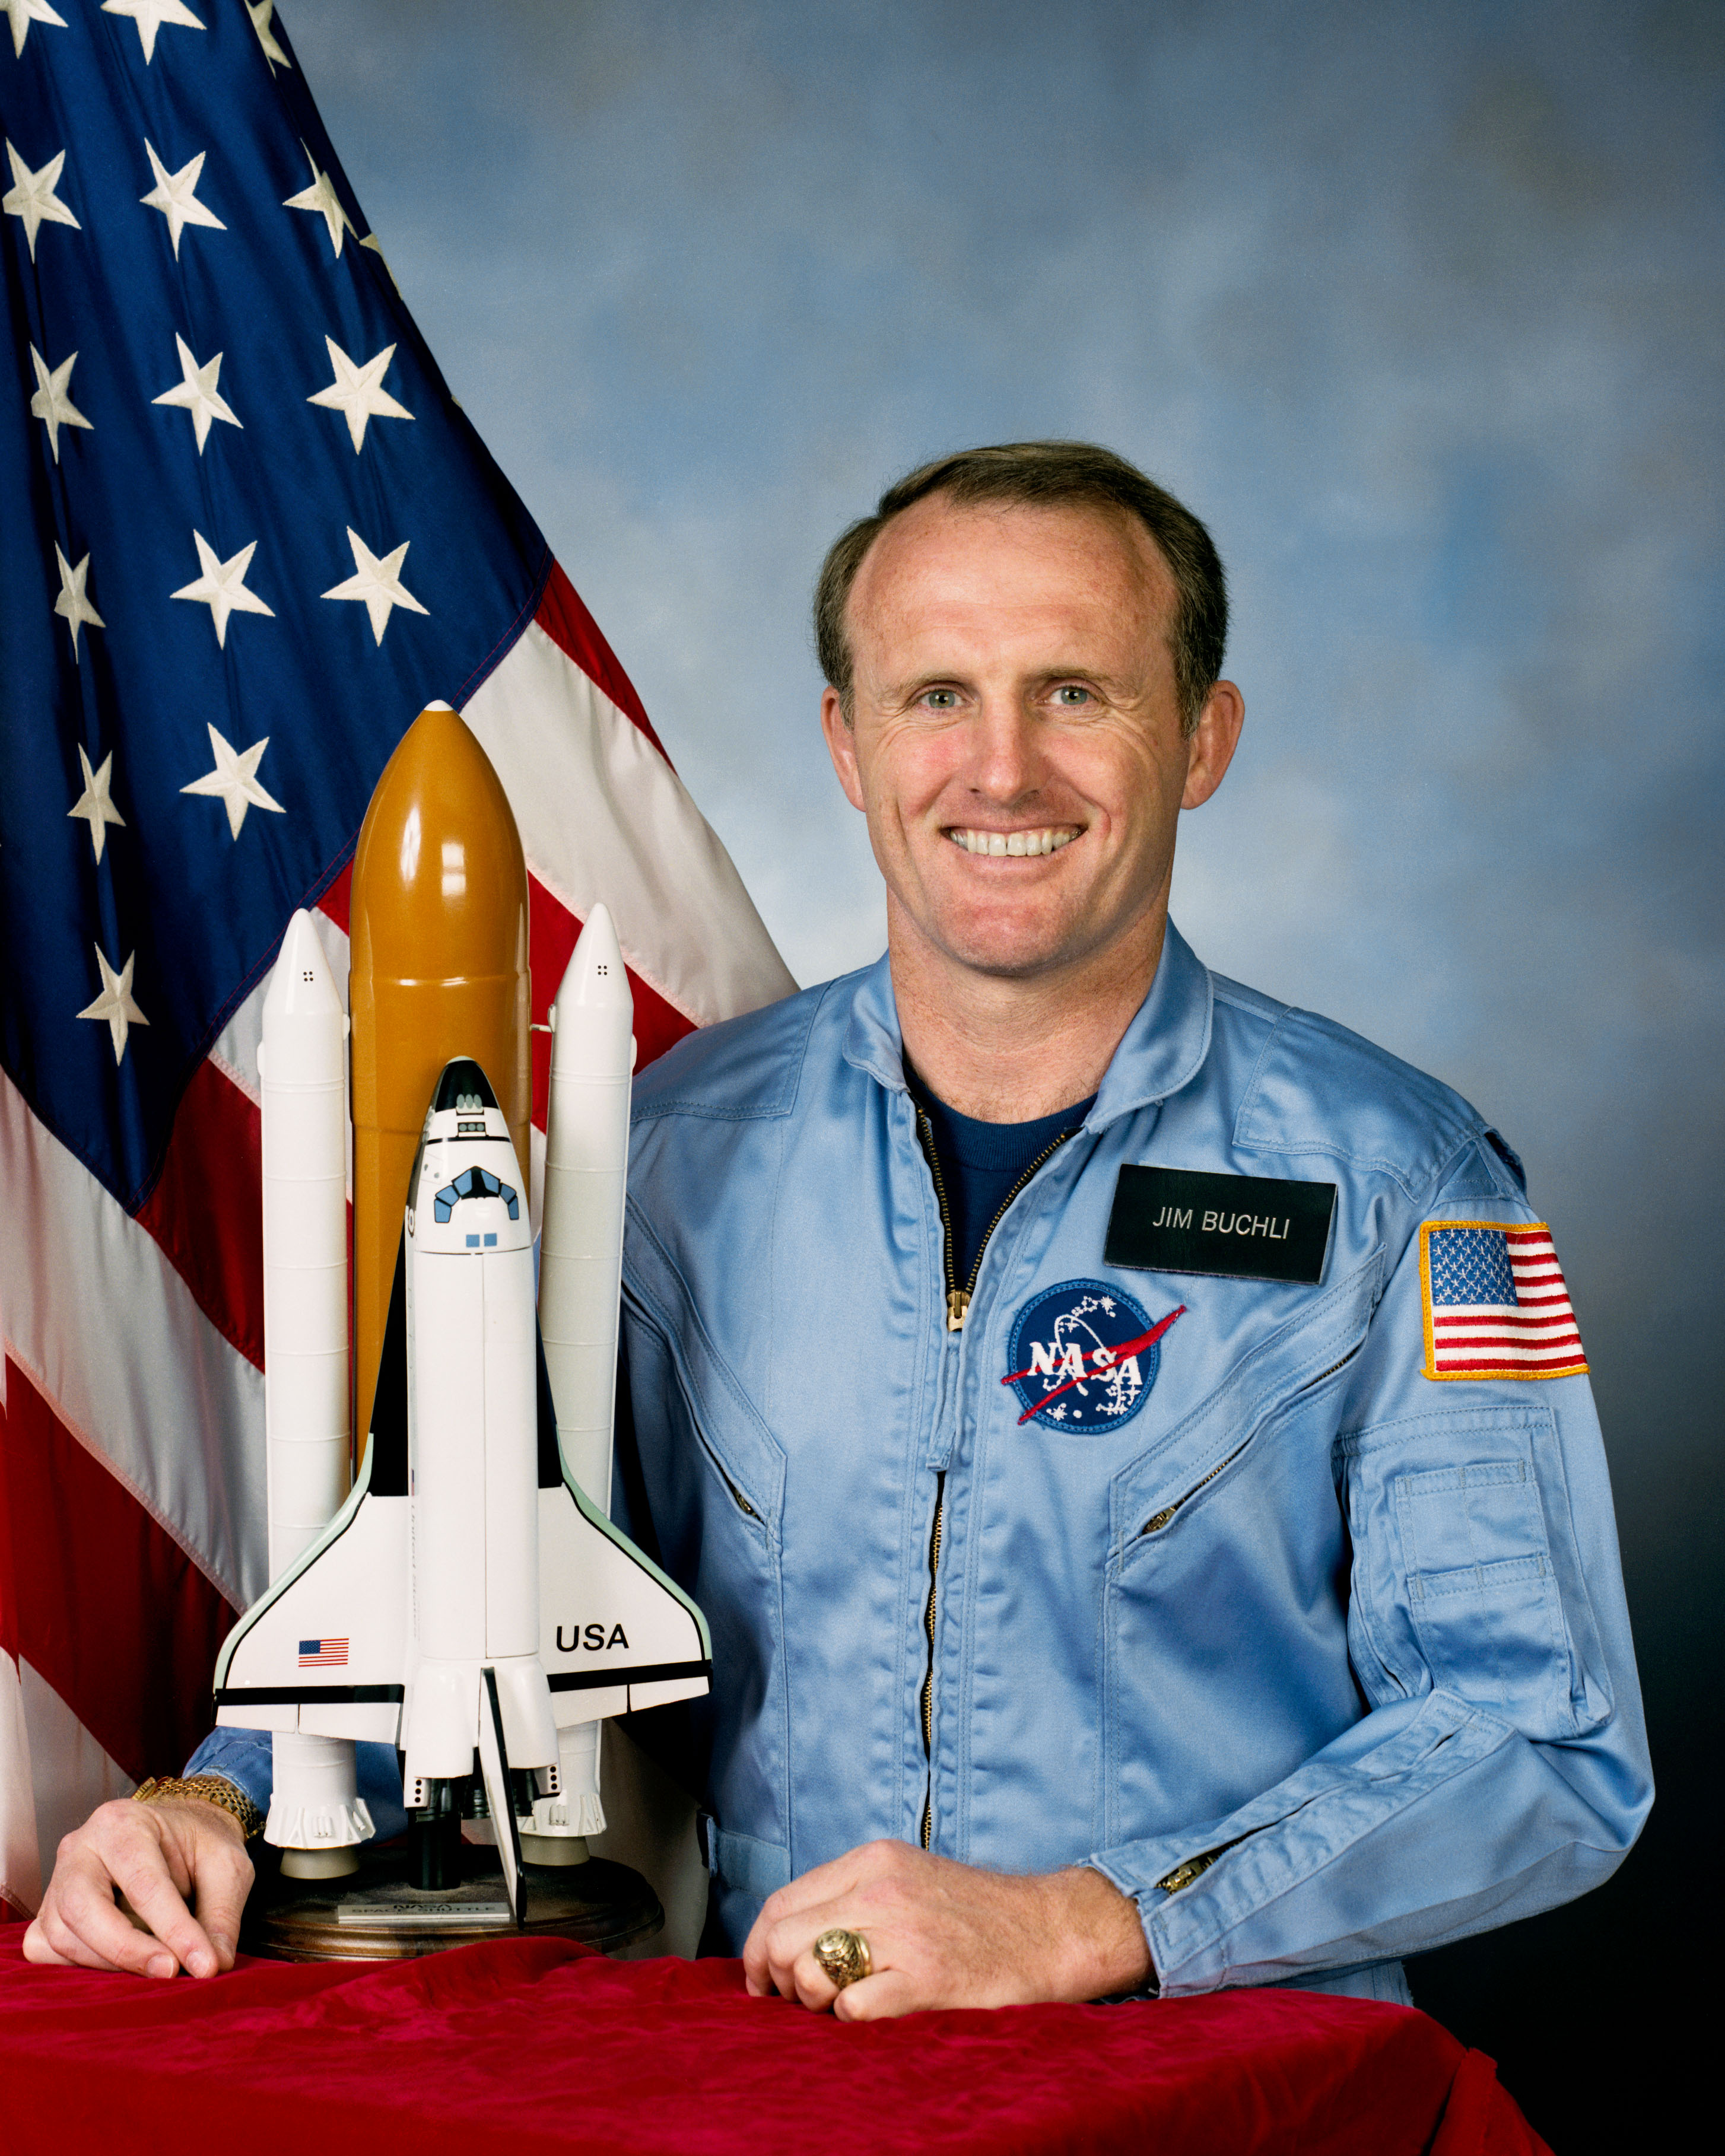 United States Marine Corps astronauts